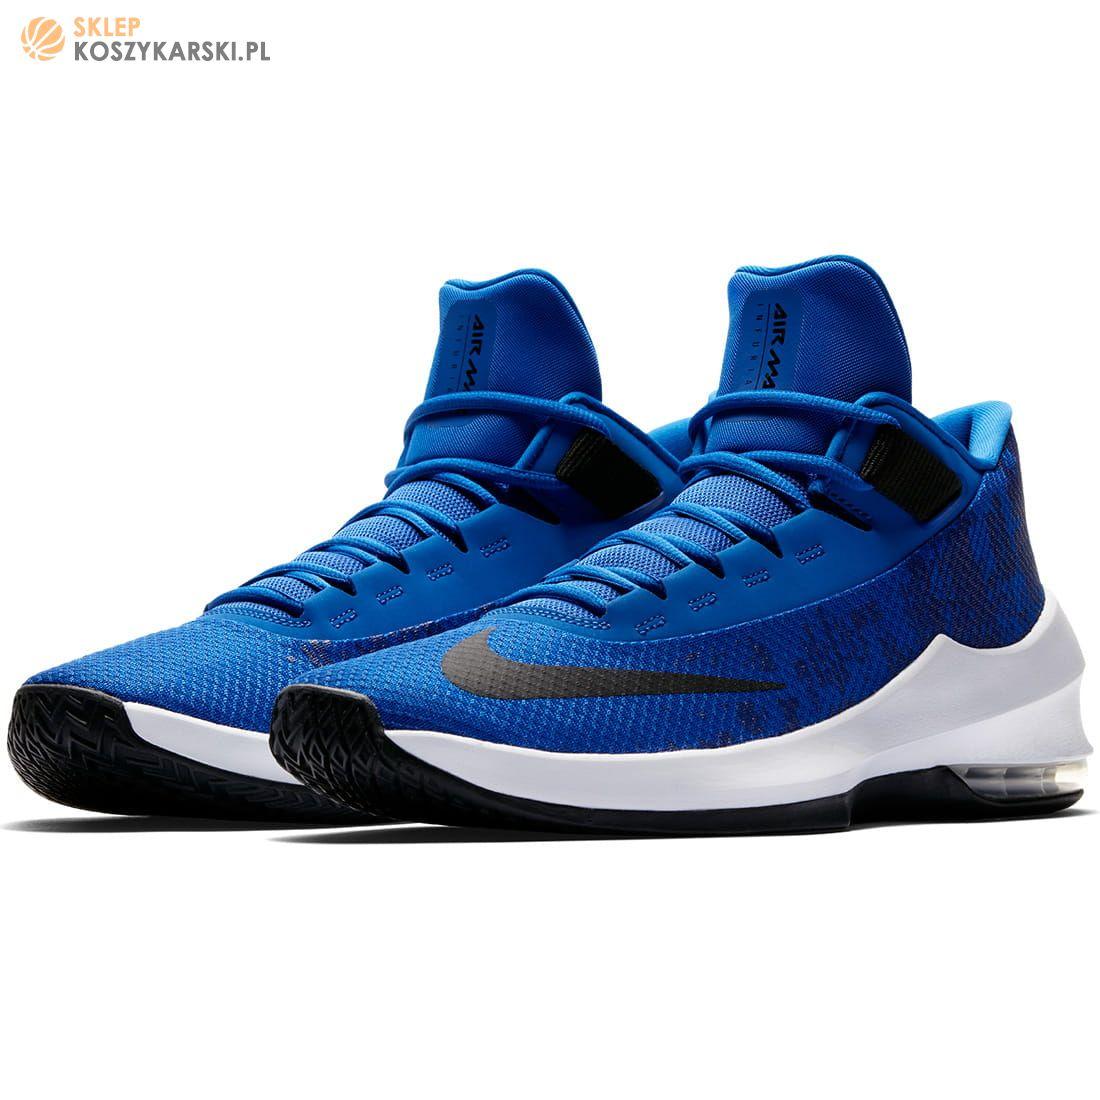 Buty koszykarskie Nike Air Max Infuriate 2 Mid (AA7066 400